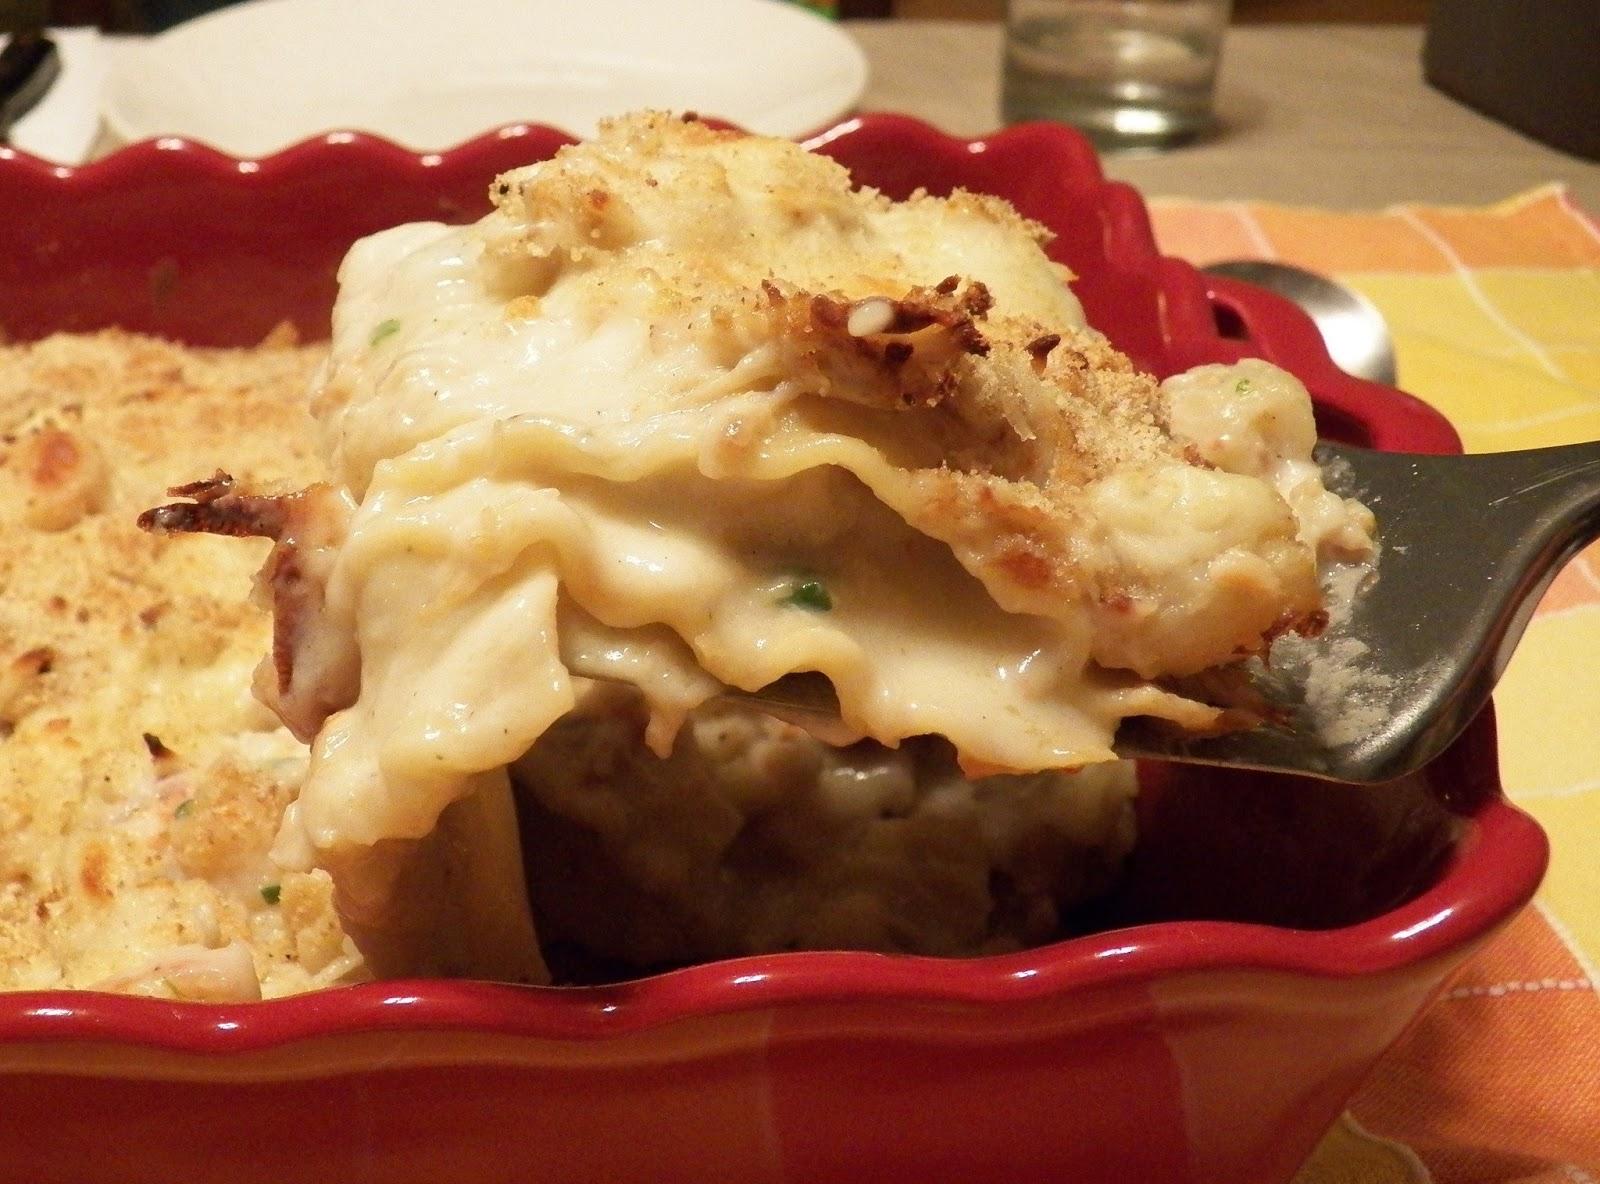 seafood lasagna with crab, shrimp, and scallop. This Seafood Lasagna ...